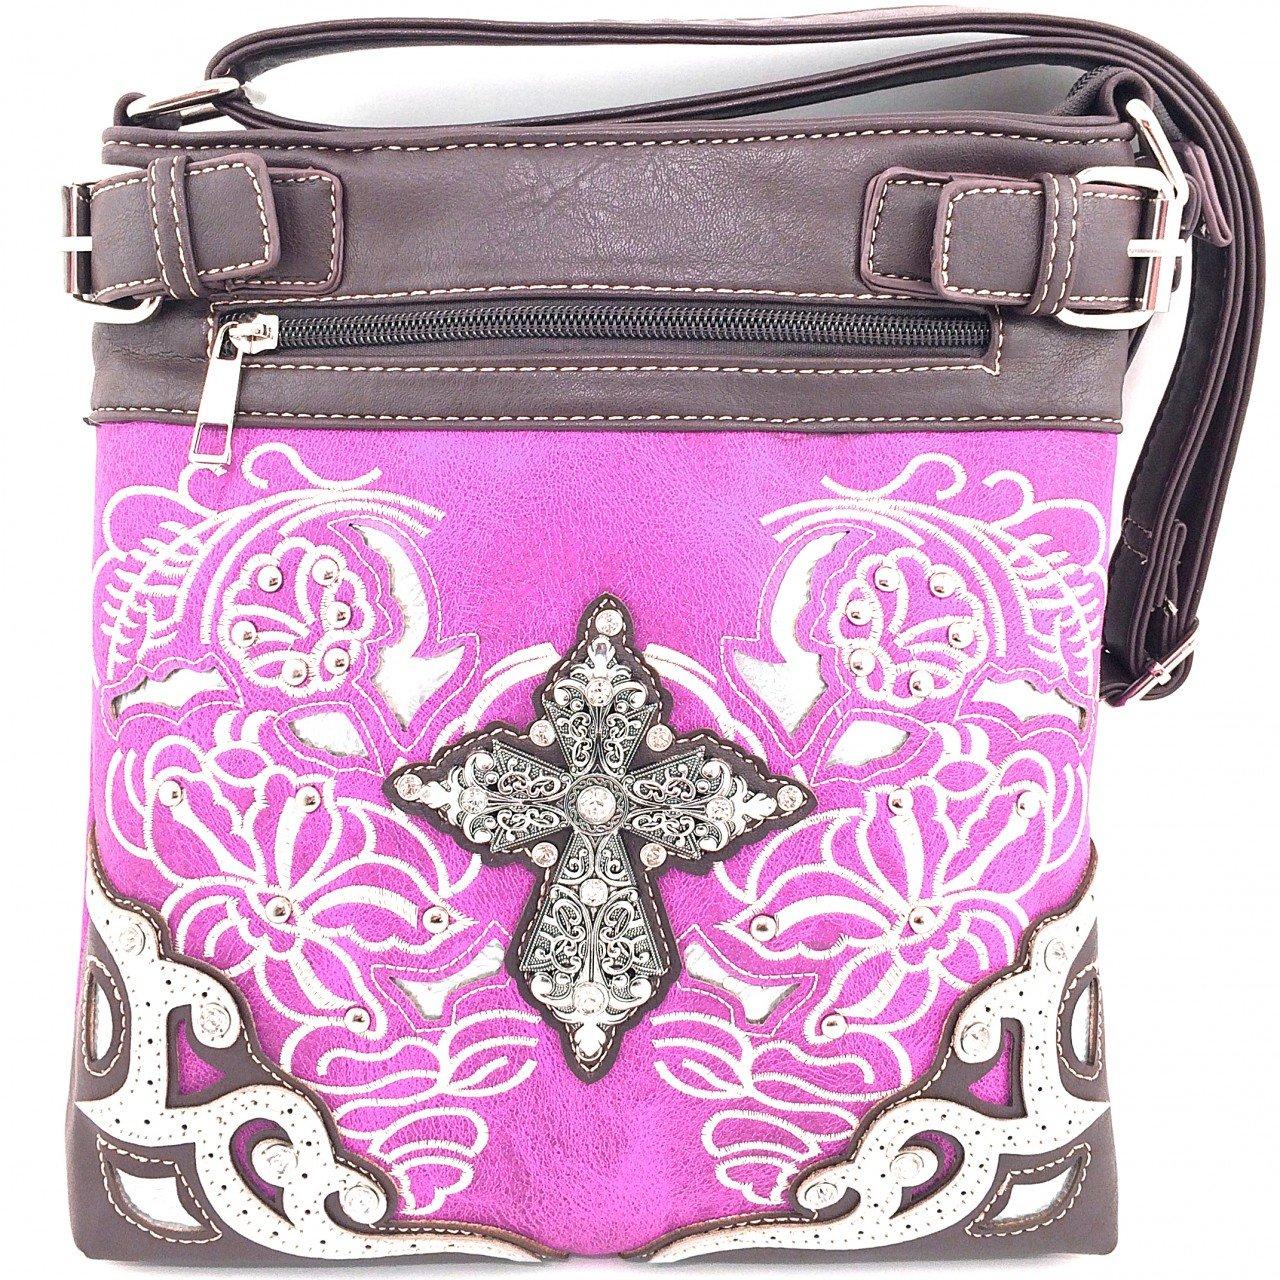 Embroidered Western Rhinestone Cross Messenger Bag Cross Body Purse (Purple)